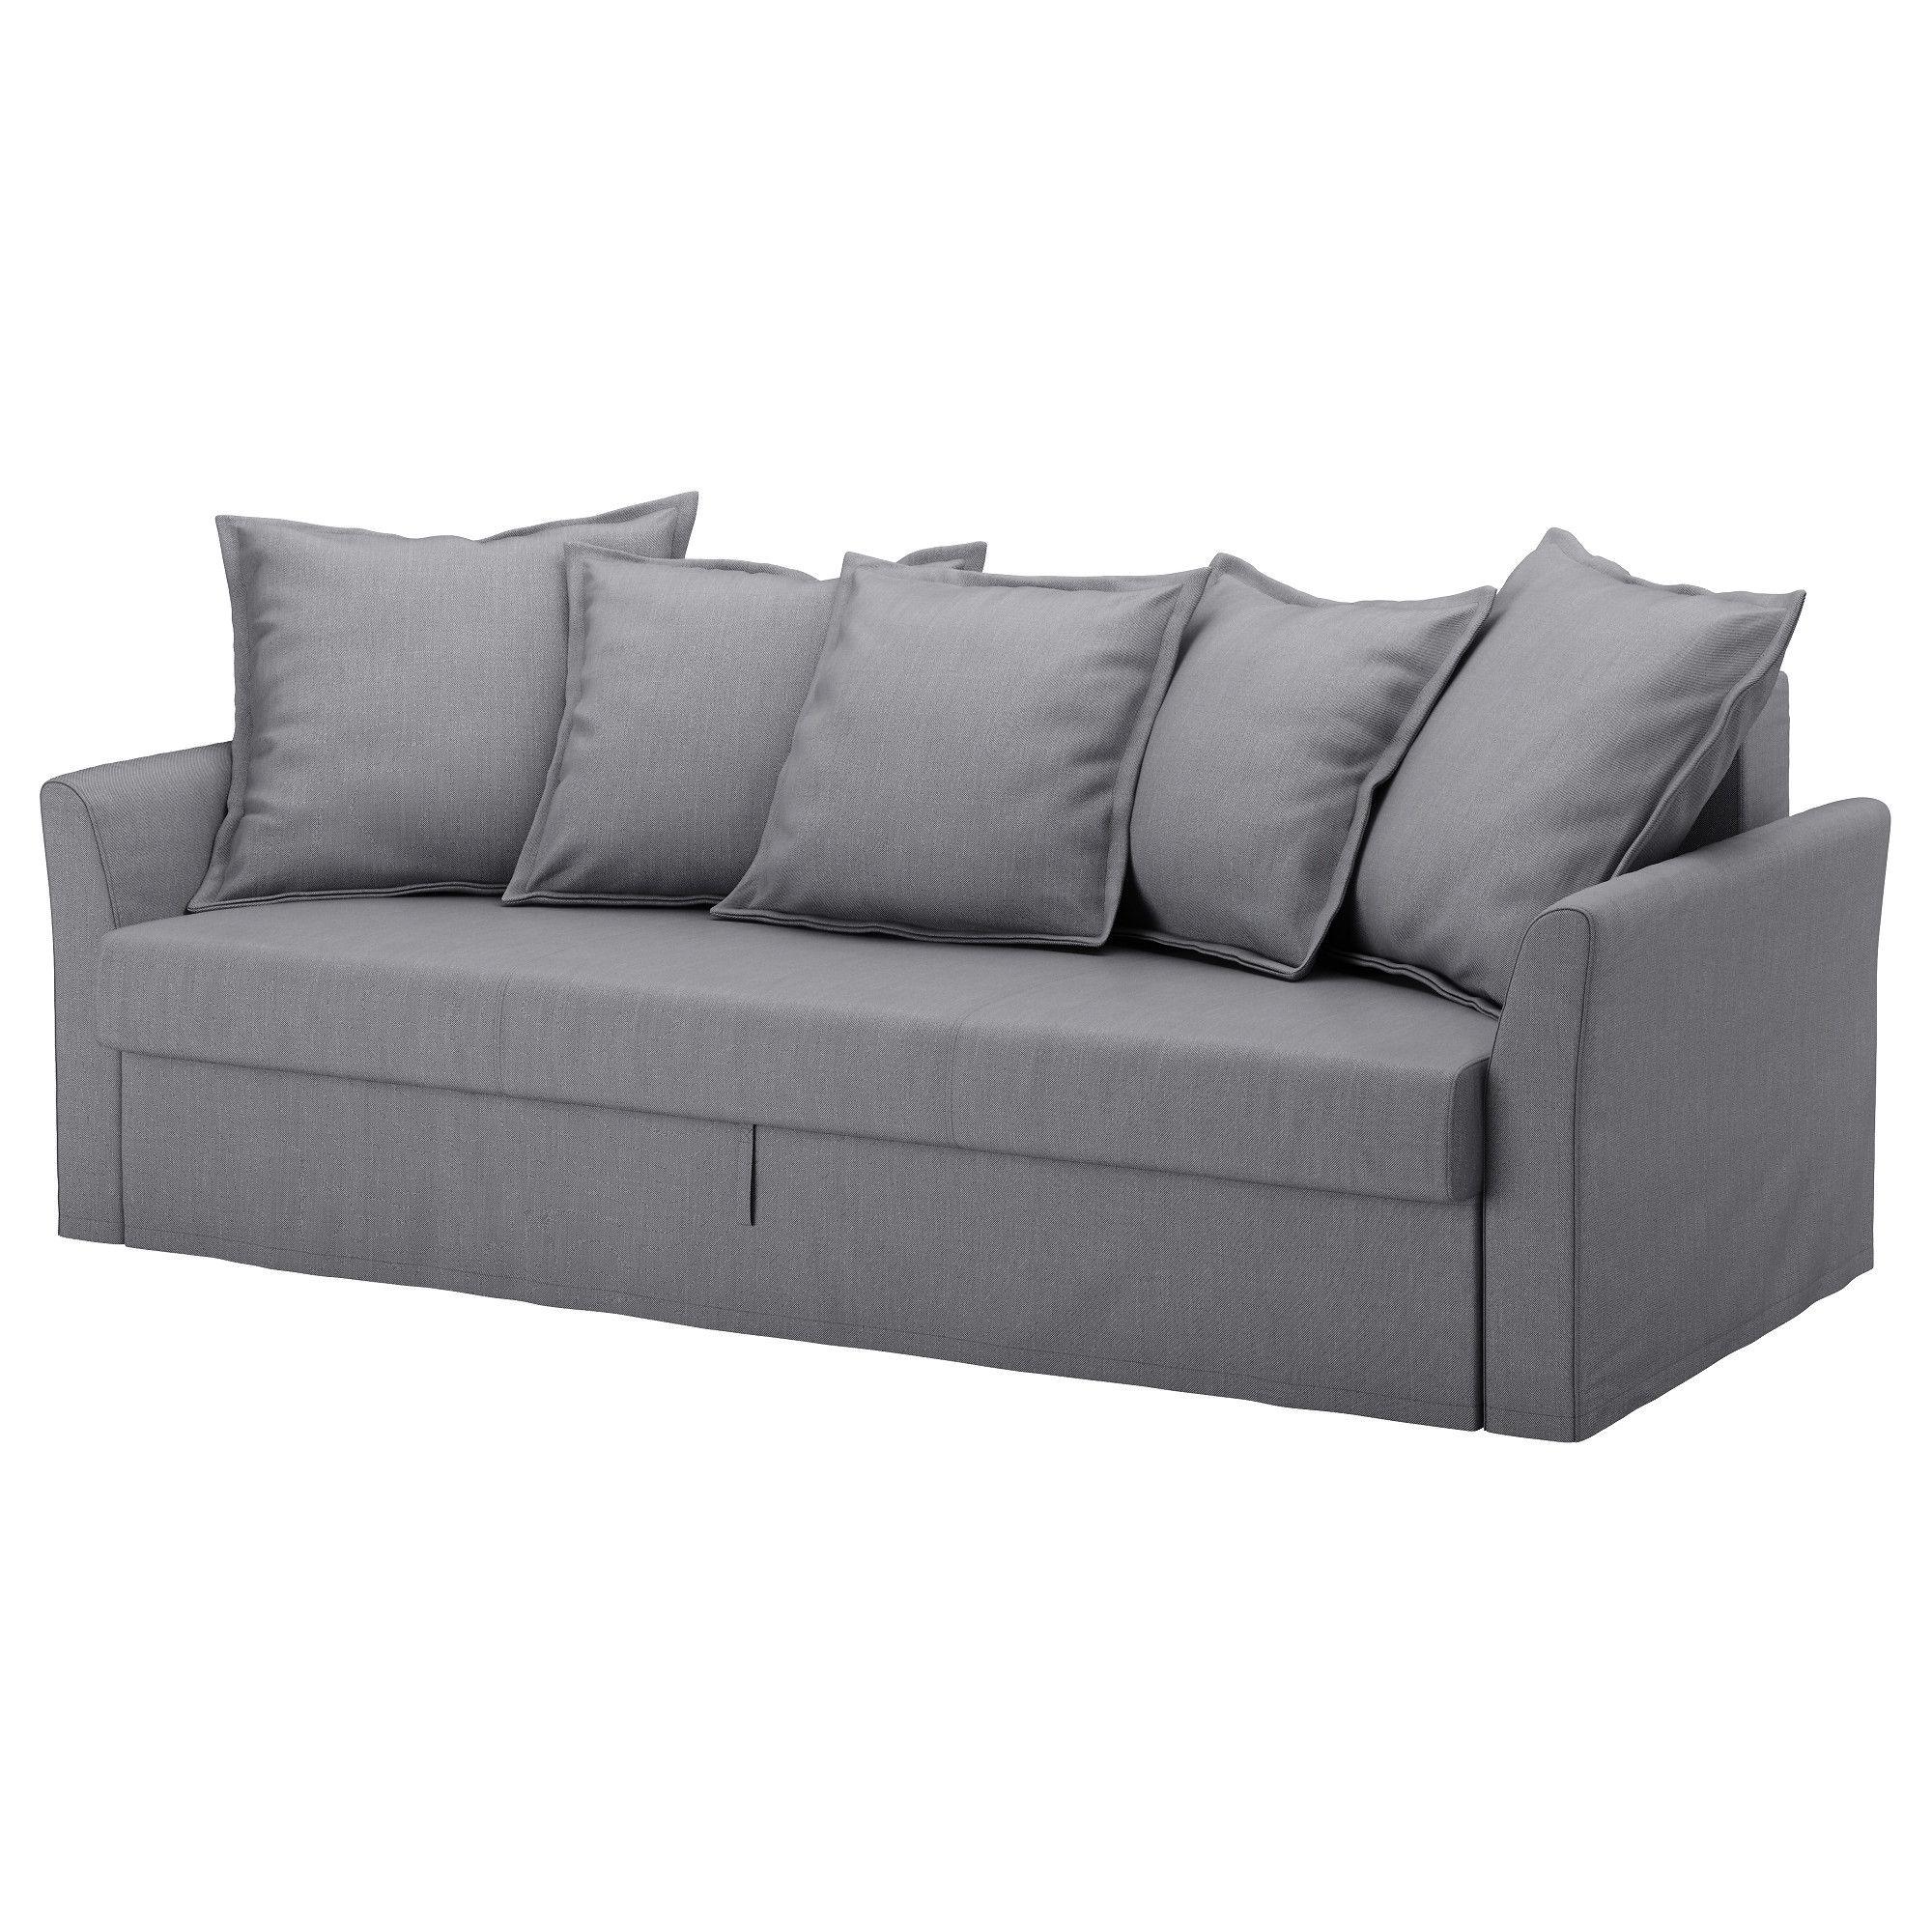 Holmsund Sofa Bed Nordvalla Medium Gray Ikea Sofa Bed Sleeper Sofa Ikea Sofa Bed